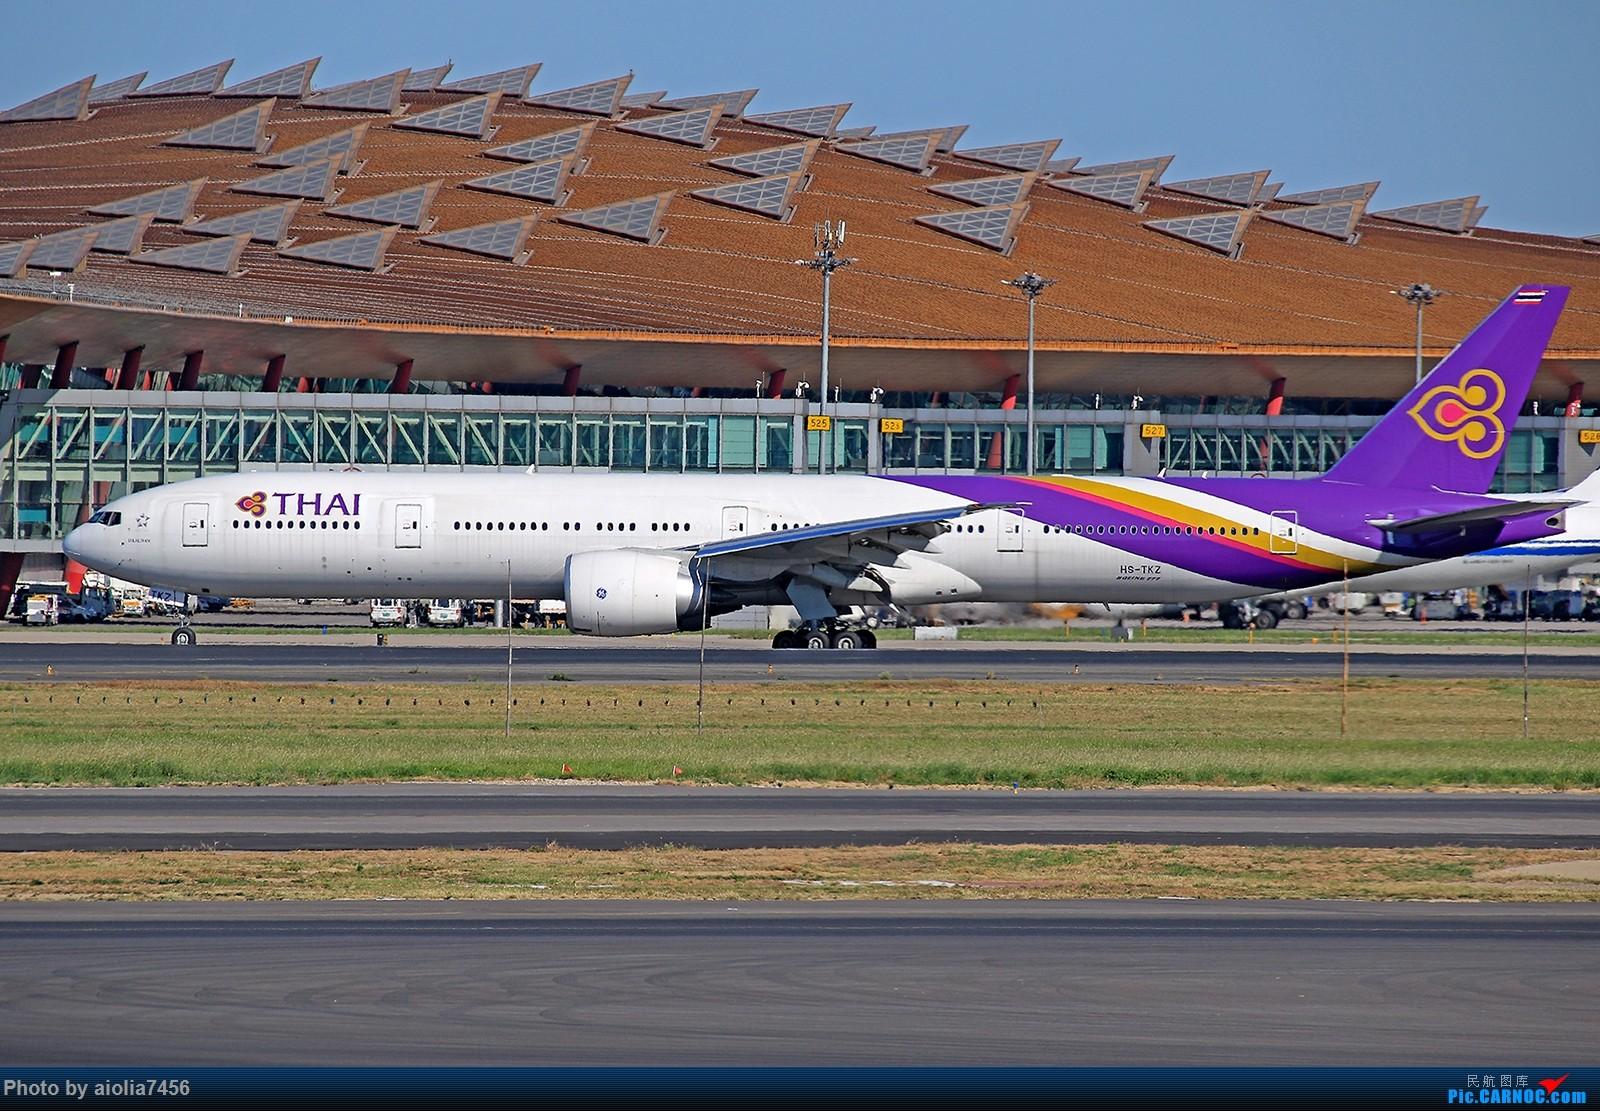 Re:[原创]合肥飞友会[霸都飞友会]冷风过境,吹回了久违的蓝天,而我刚刚好路过PEK BOEING 777-300ER HS-TKZ 中国北京首都国际机场